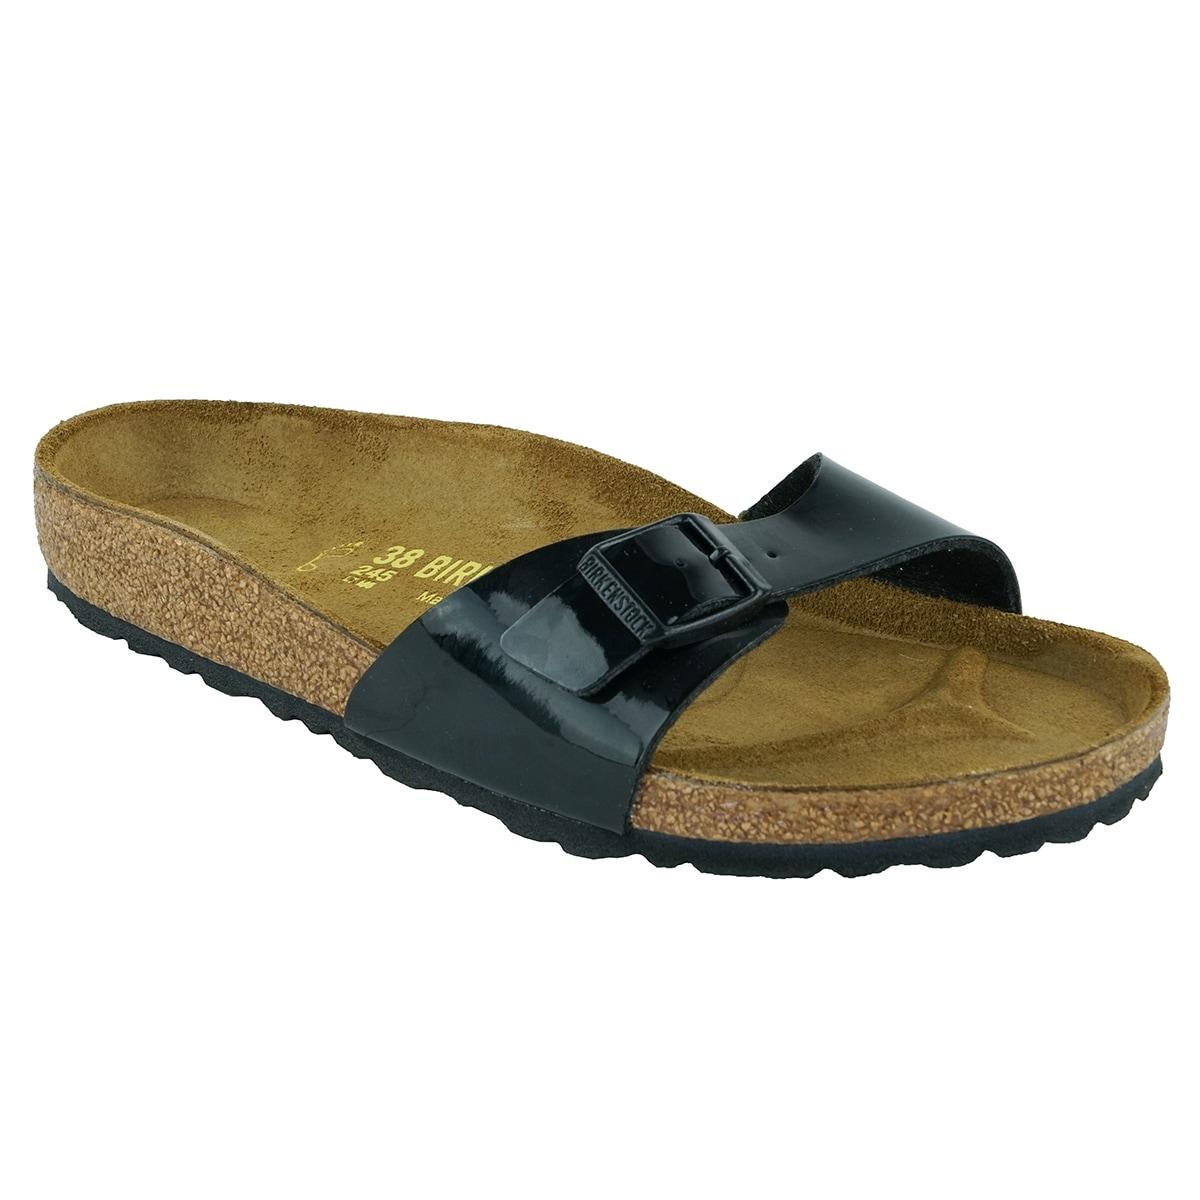 Shop Birkenstock Madrid Birko-Flor Sandals - Free Shipping Today -  Overstock.com - 24085267 ed15c6a74